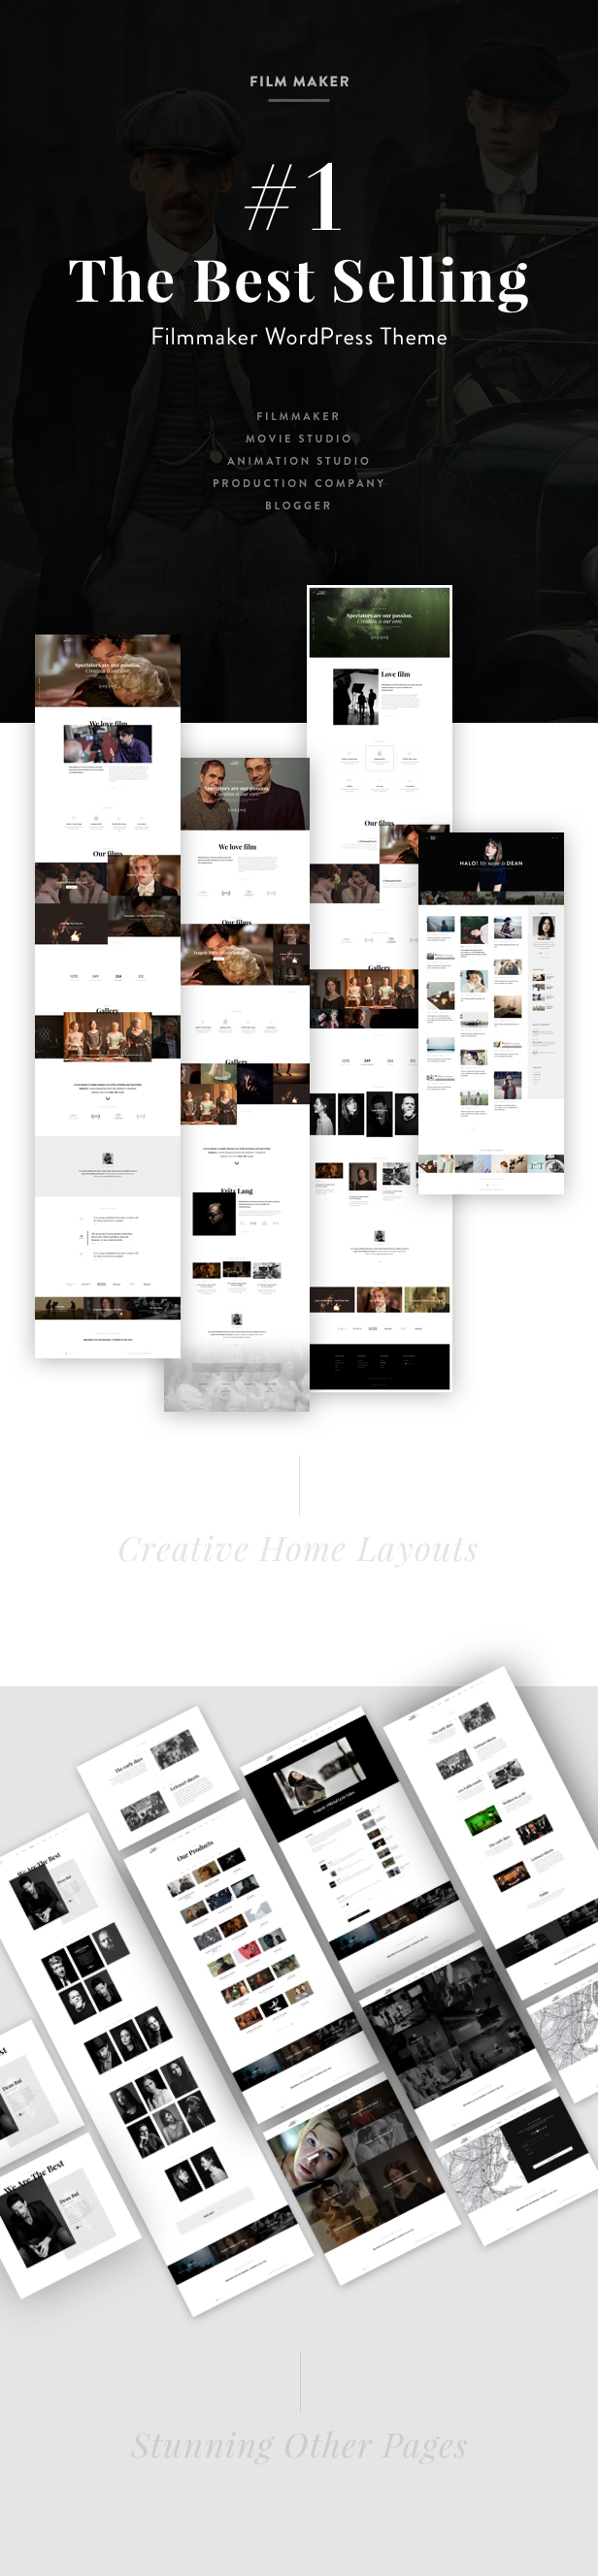 FilmMaker WordPress Theme: Film Studio - Movie Production - Video Blogger - Creative Agency 5